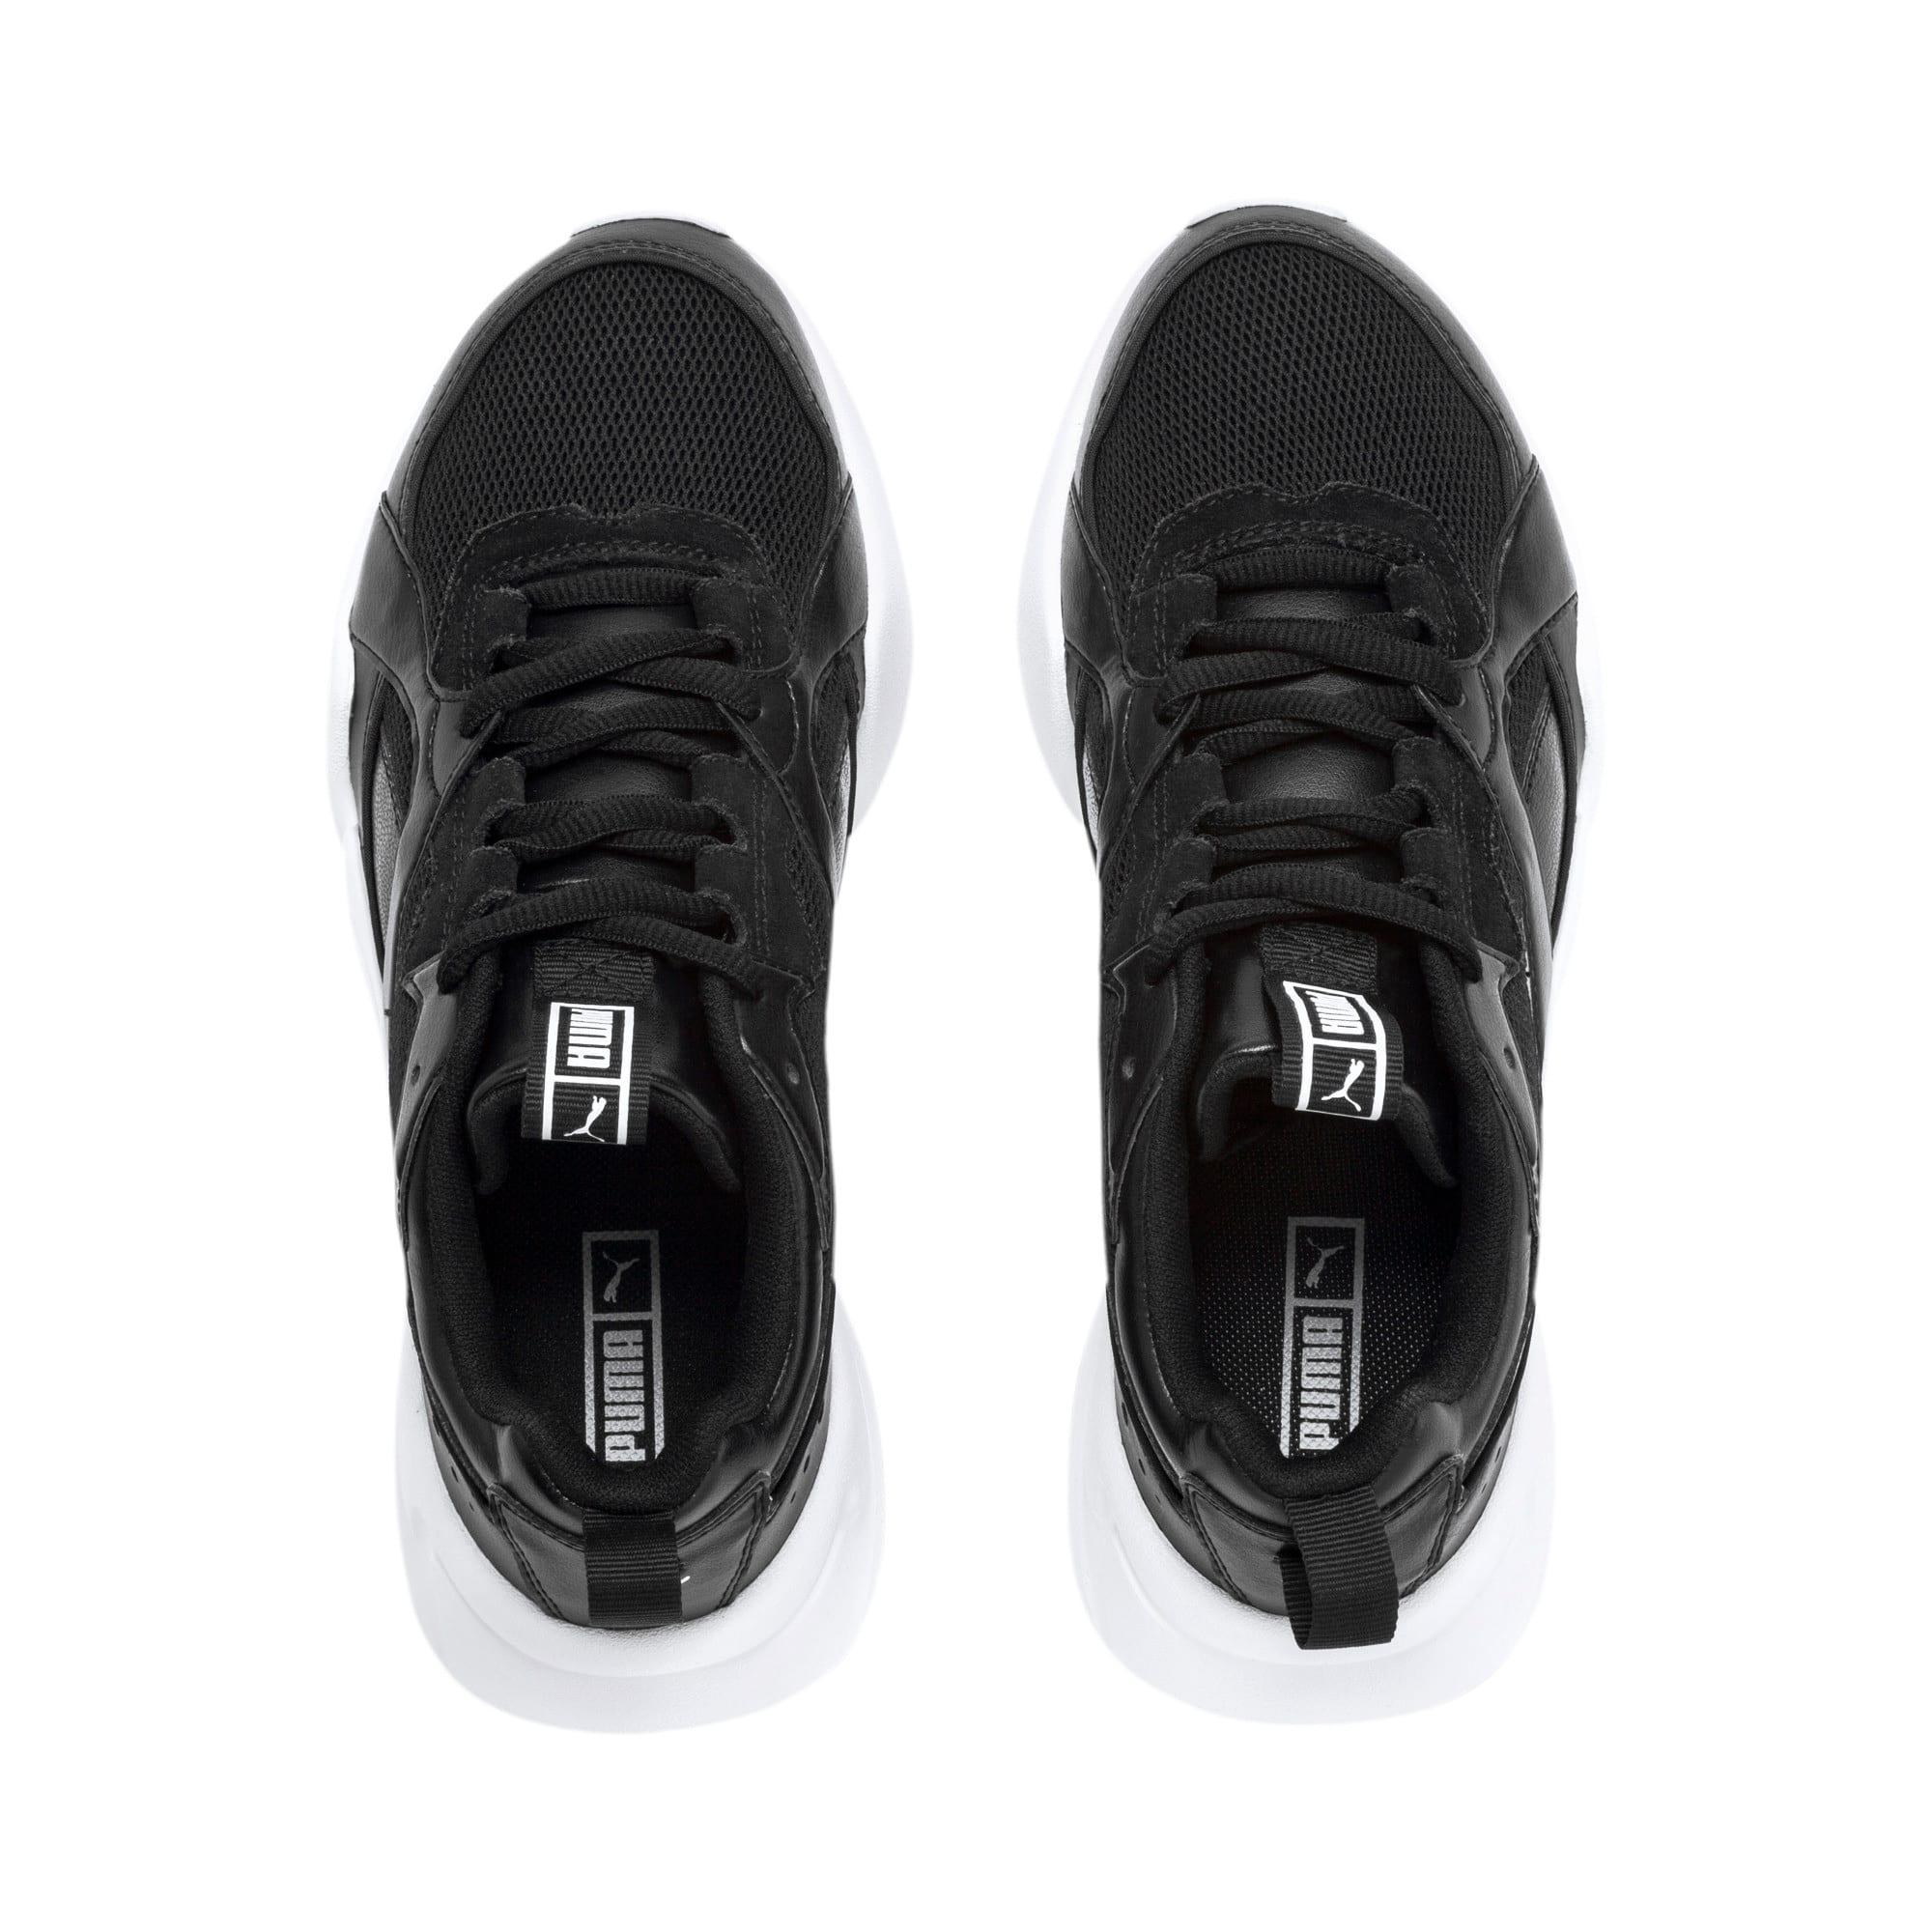 Thumbnail 7 of Nova 2 Women's Sneakers, Puma Black-Heather, medium